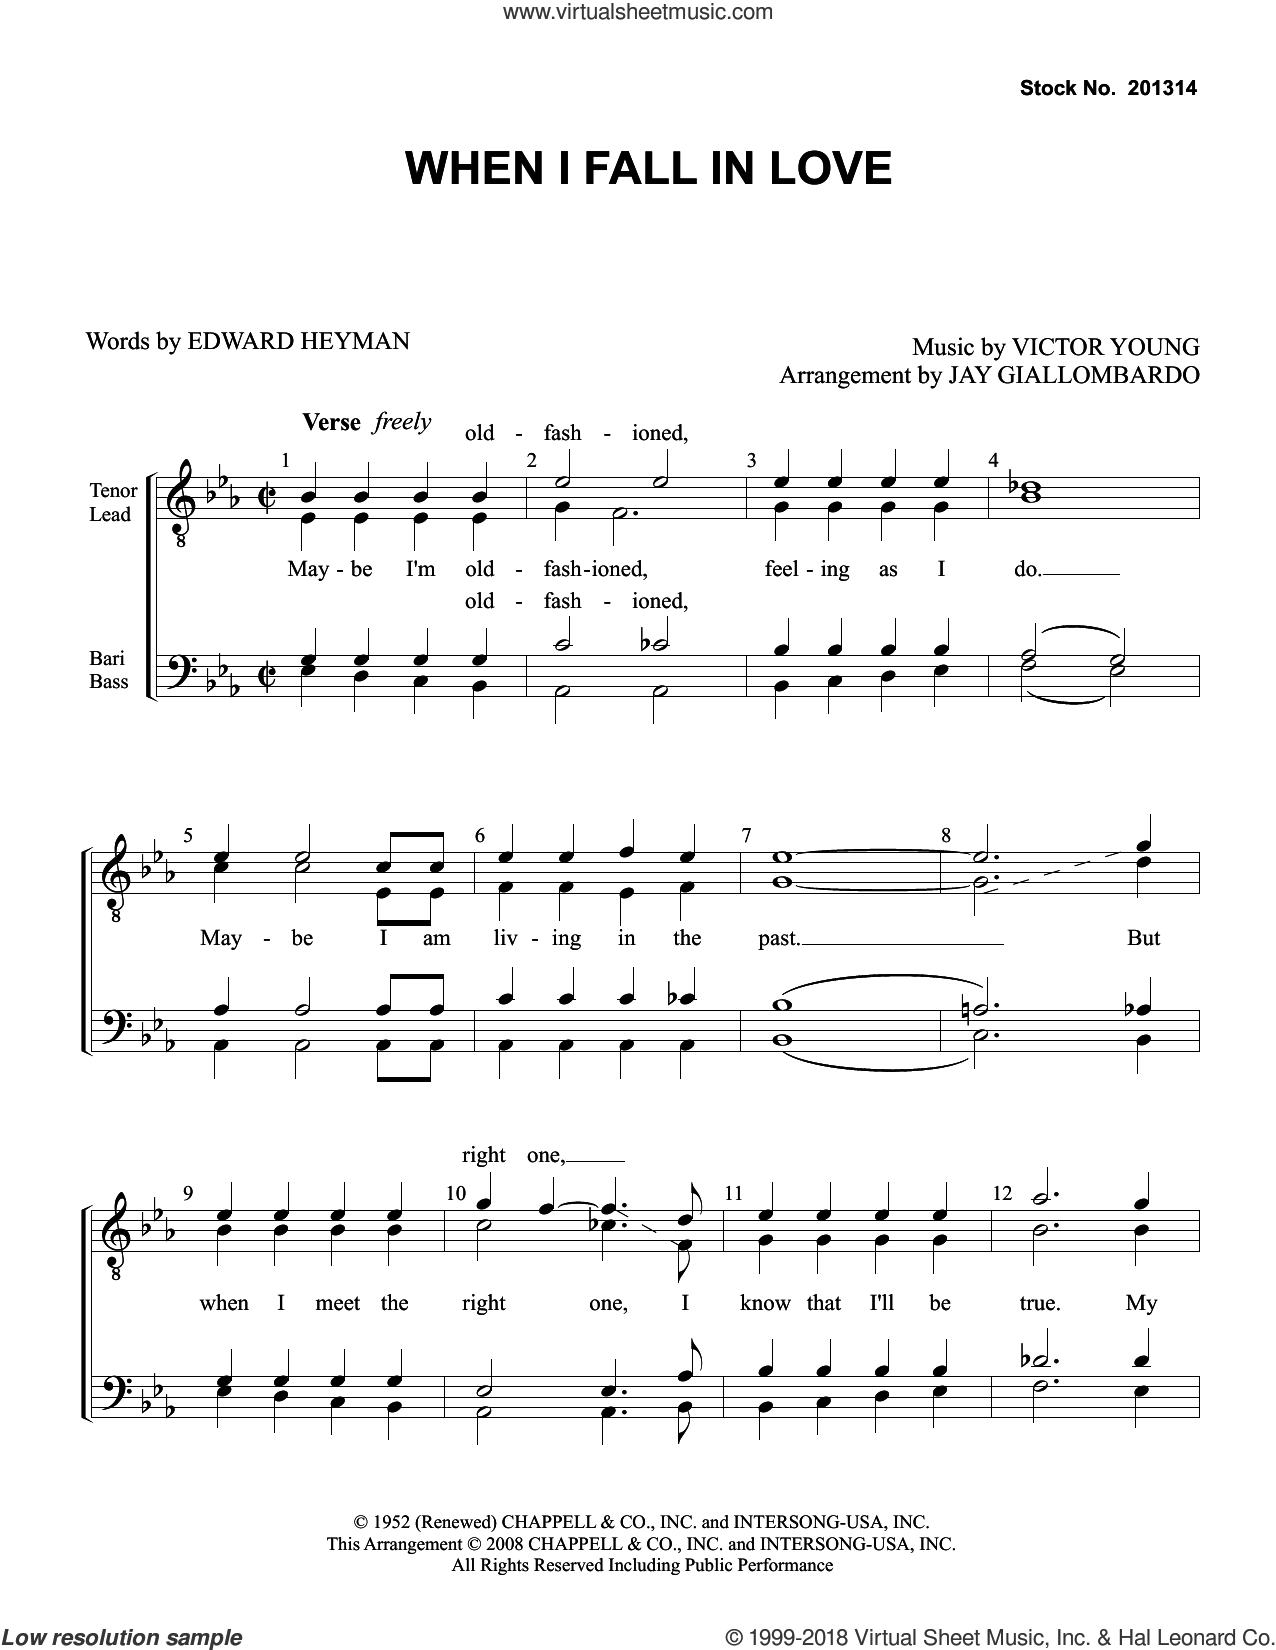 When I Fall In Love (arr. Jay Giallombardo) sheet music for choir (TTBB: tenor, bass) by Doris Day, Jay Giallombardo, Carpenters, Edward Heyman and Victor Young, intermediate skill level